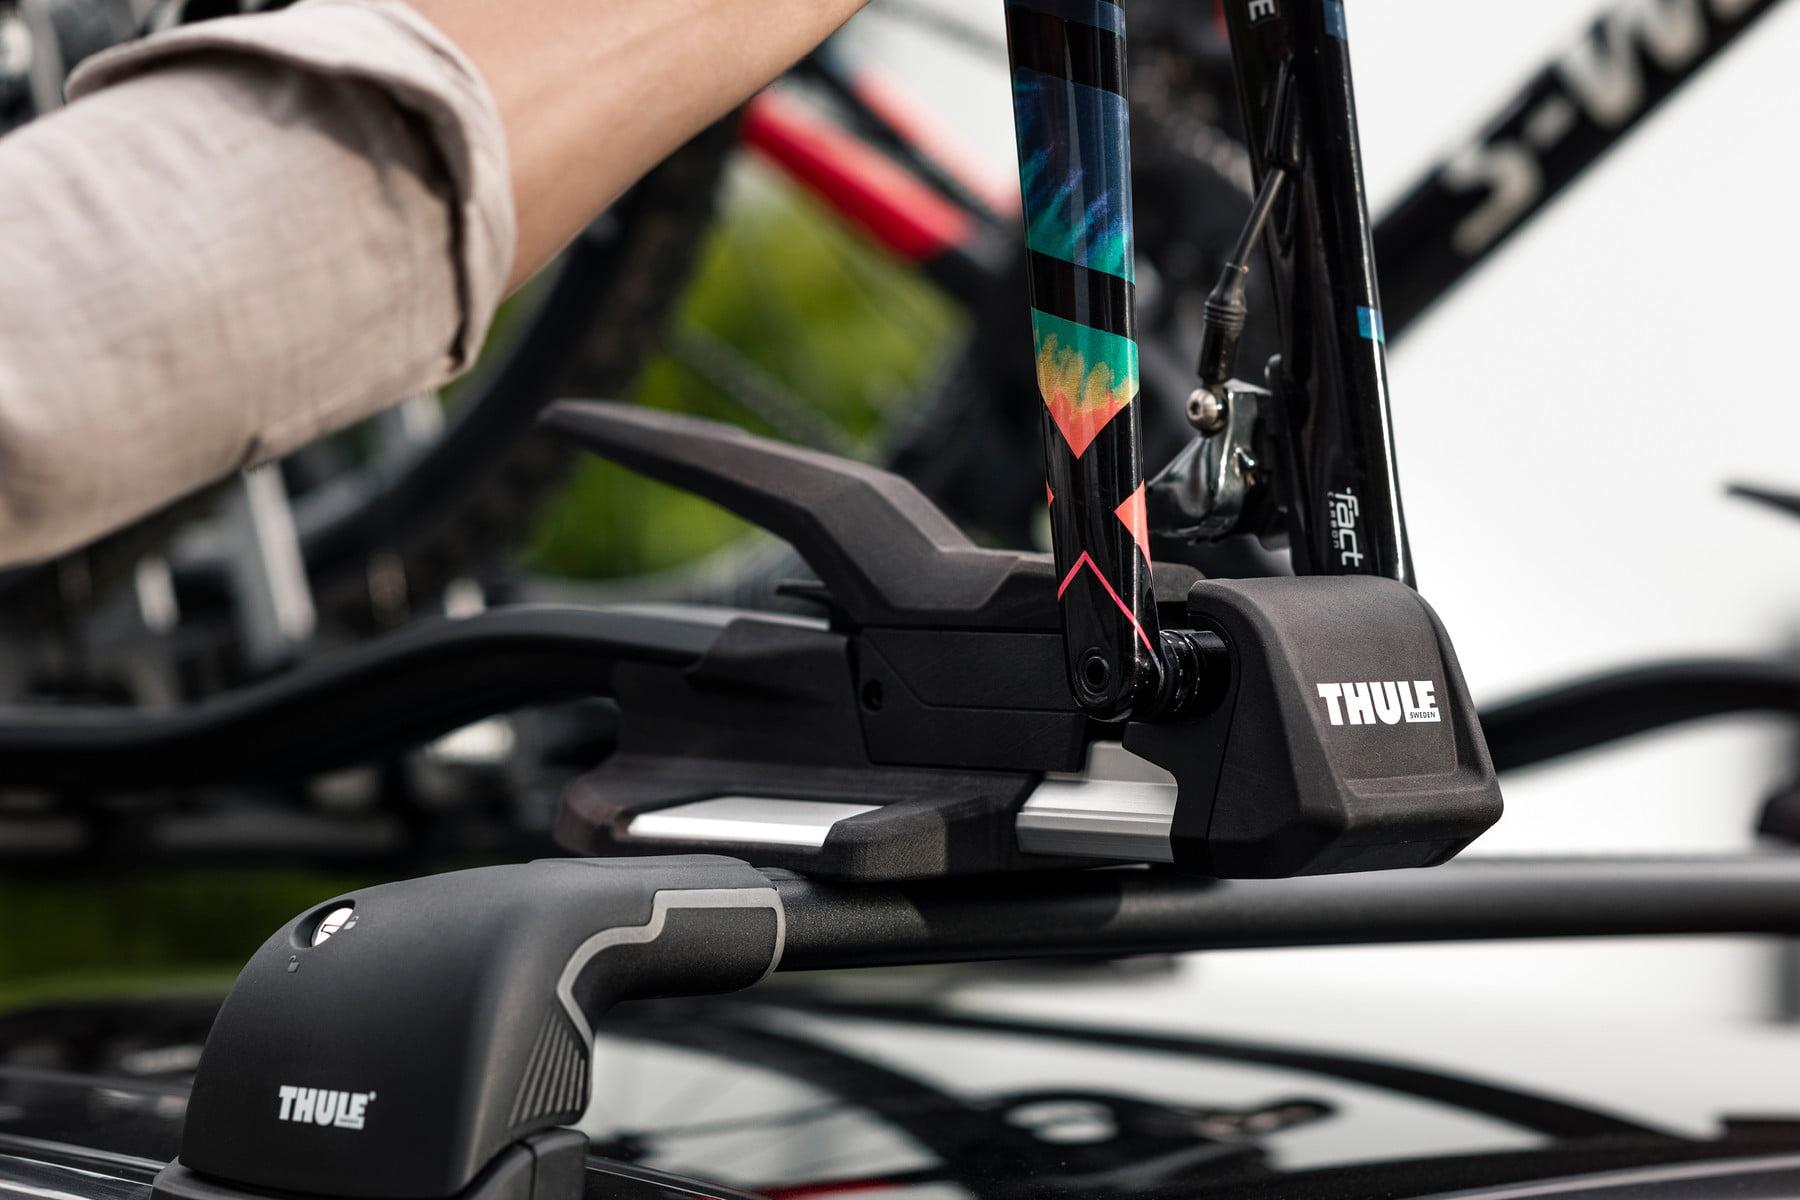 Suport biciclete Thule TopRide cu prindere pe bare transversale 4